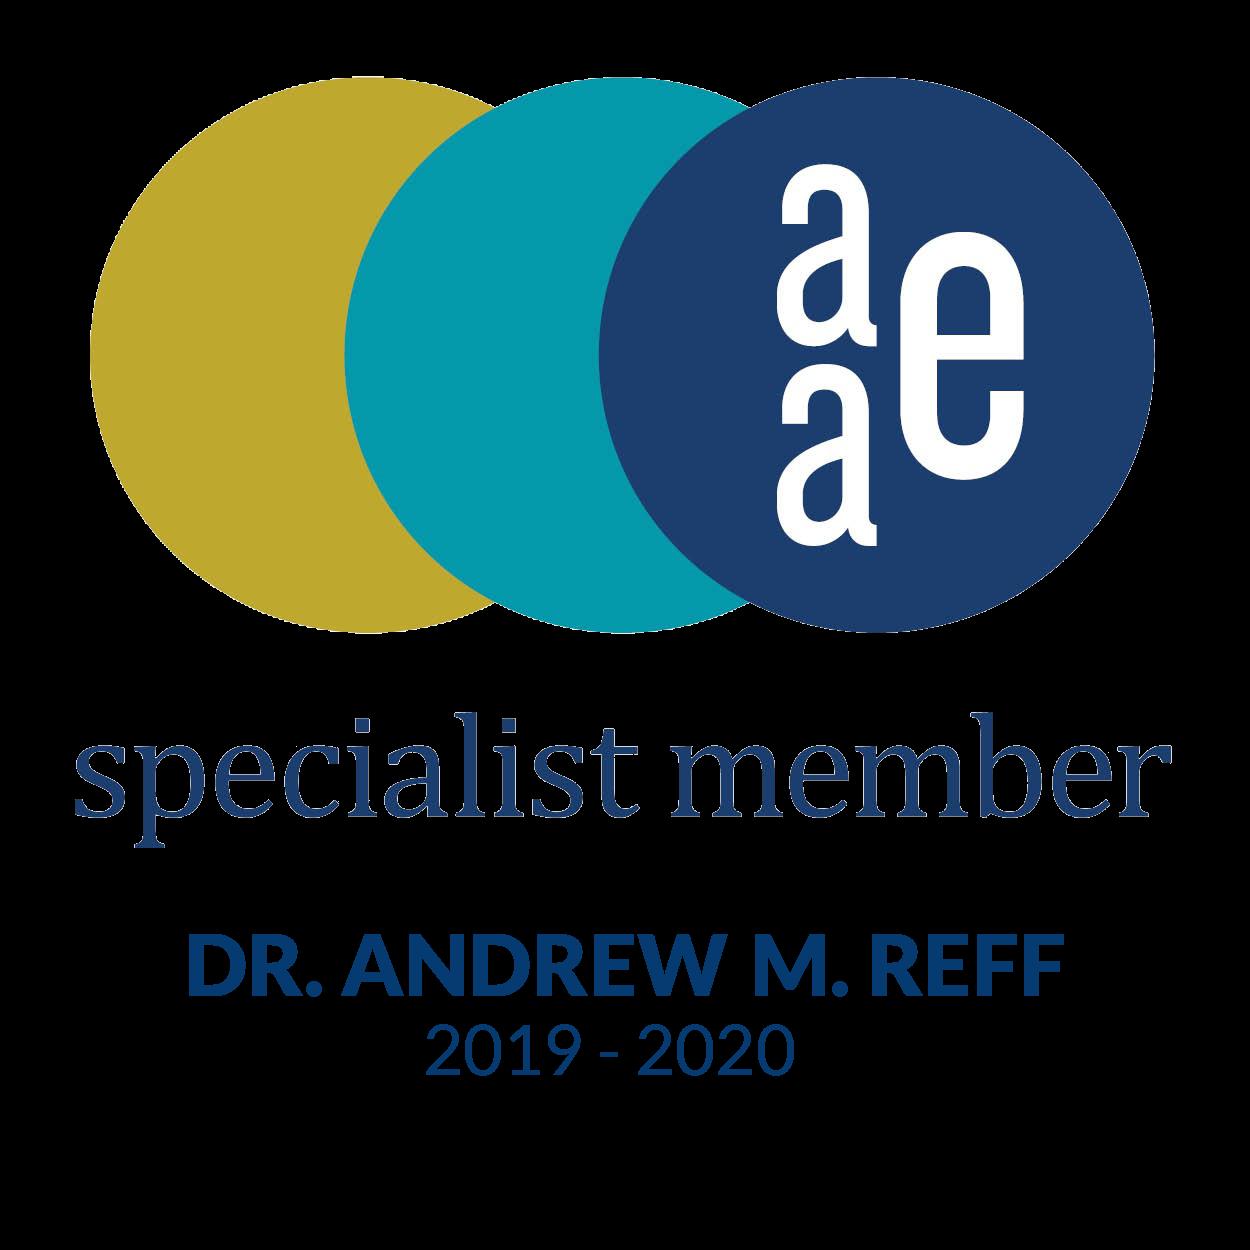 AAE-Logo-Andrew-M-Reff-DDSMS-2019-2020